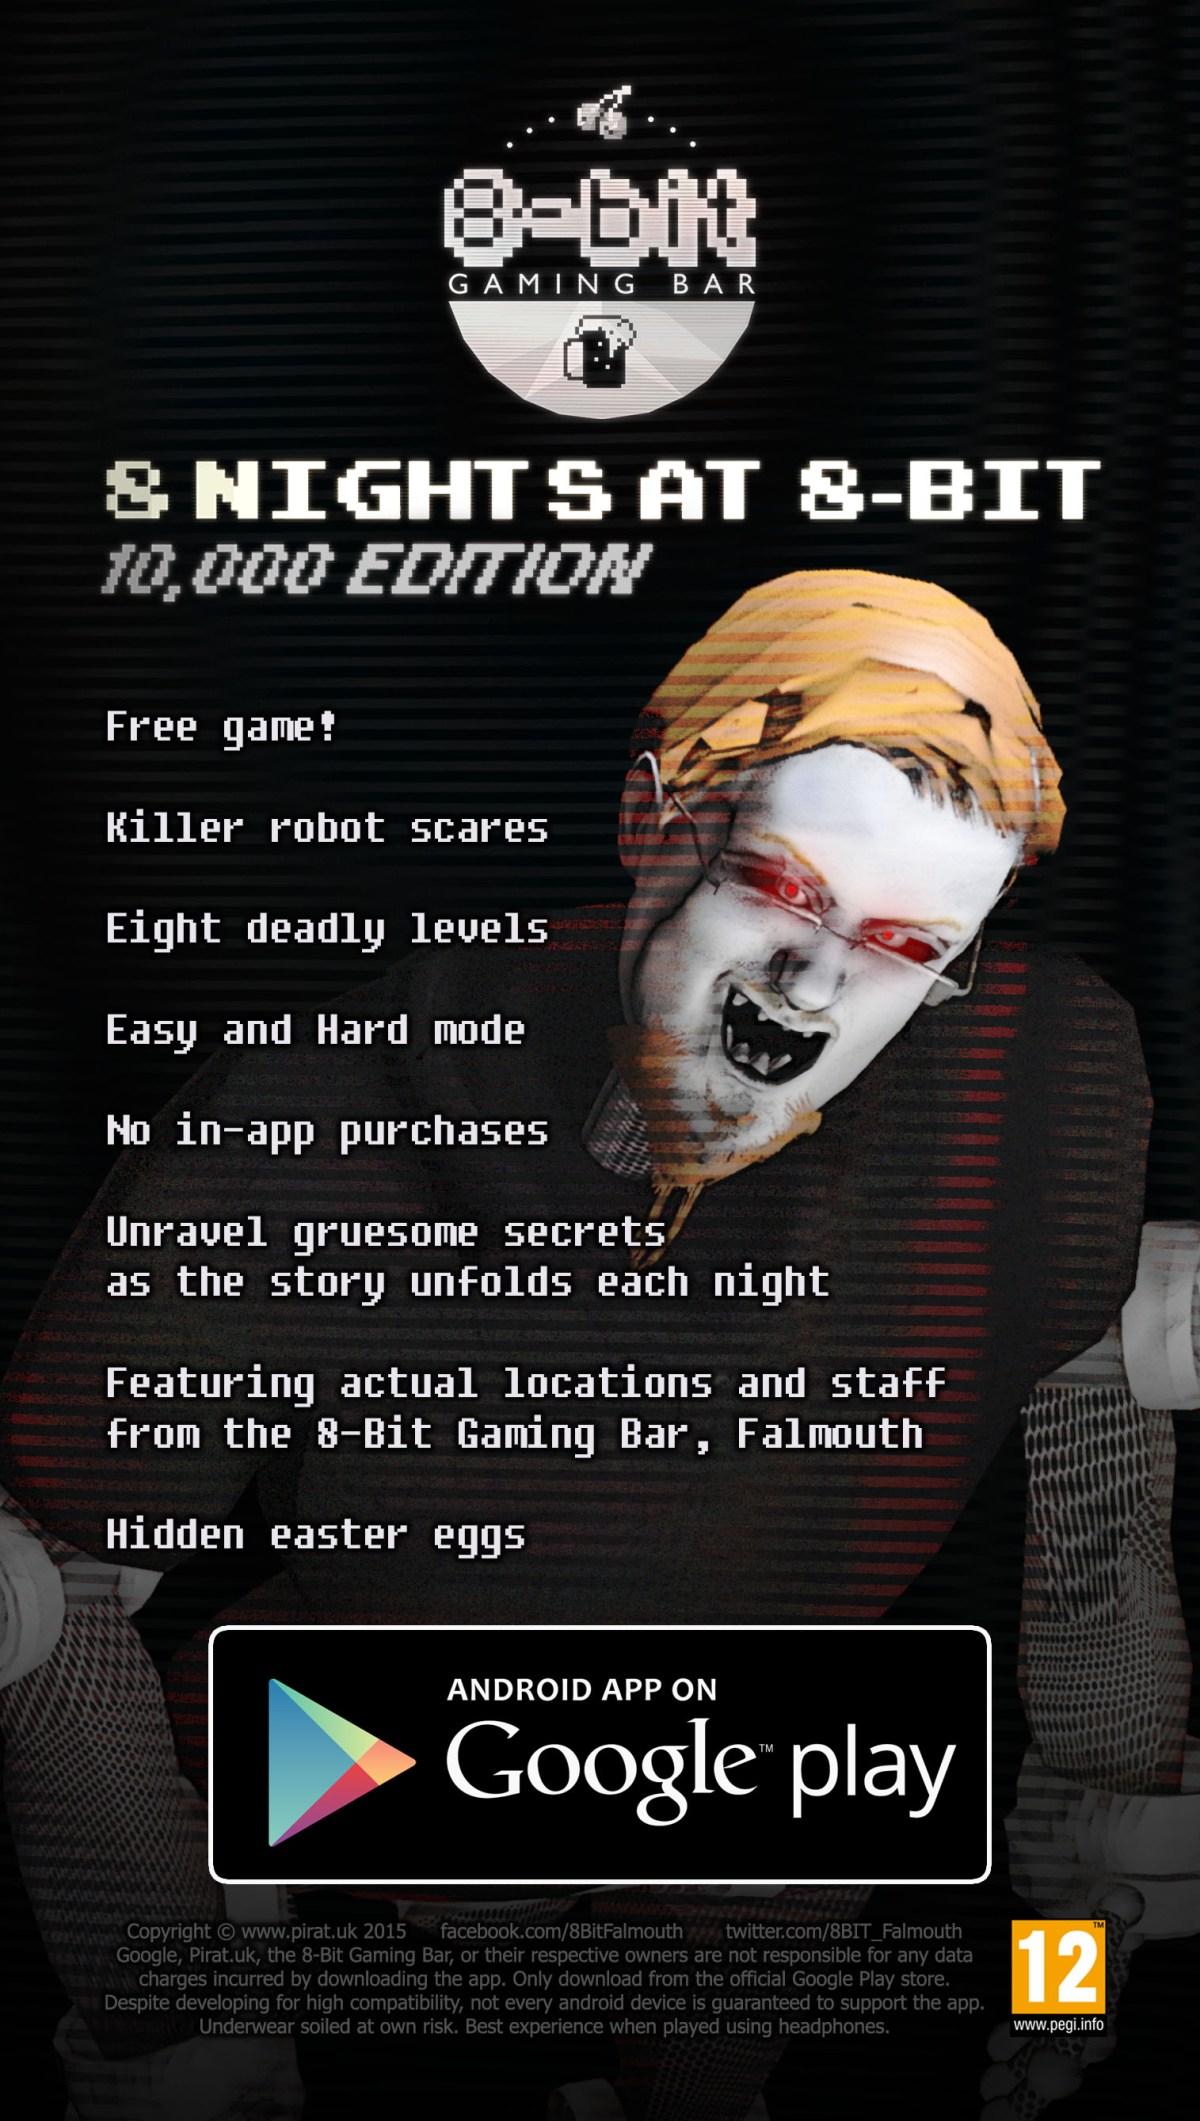 8 Nights at 8-Bit – 10,000 EDITION